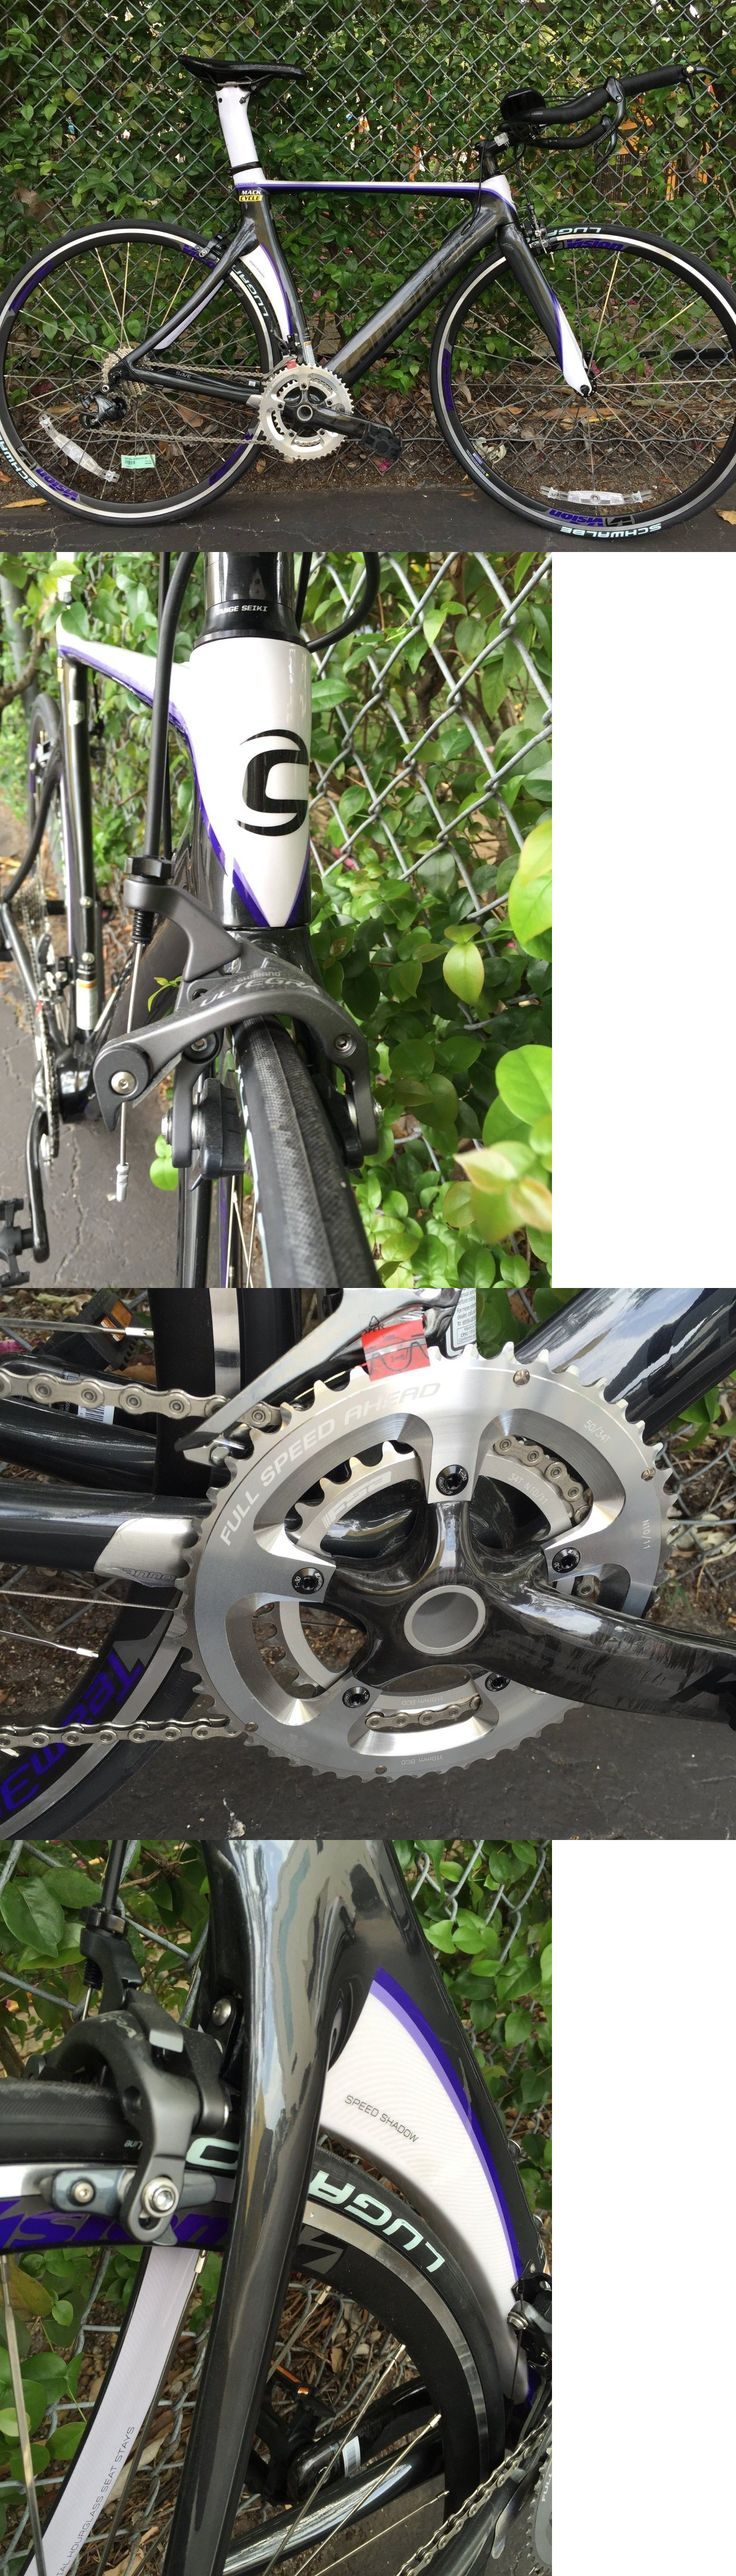 Bicycles 177831: Cannondale Slice 3 Ultegra Triathlon Bike - 54 - Reg. $3140 -> BUY IT NOW ONLY: $1099 on eBay!